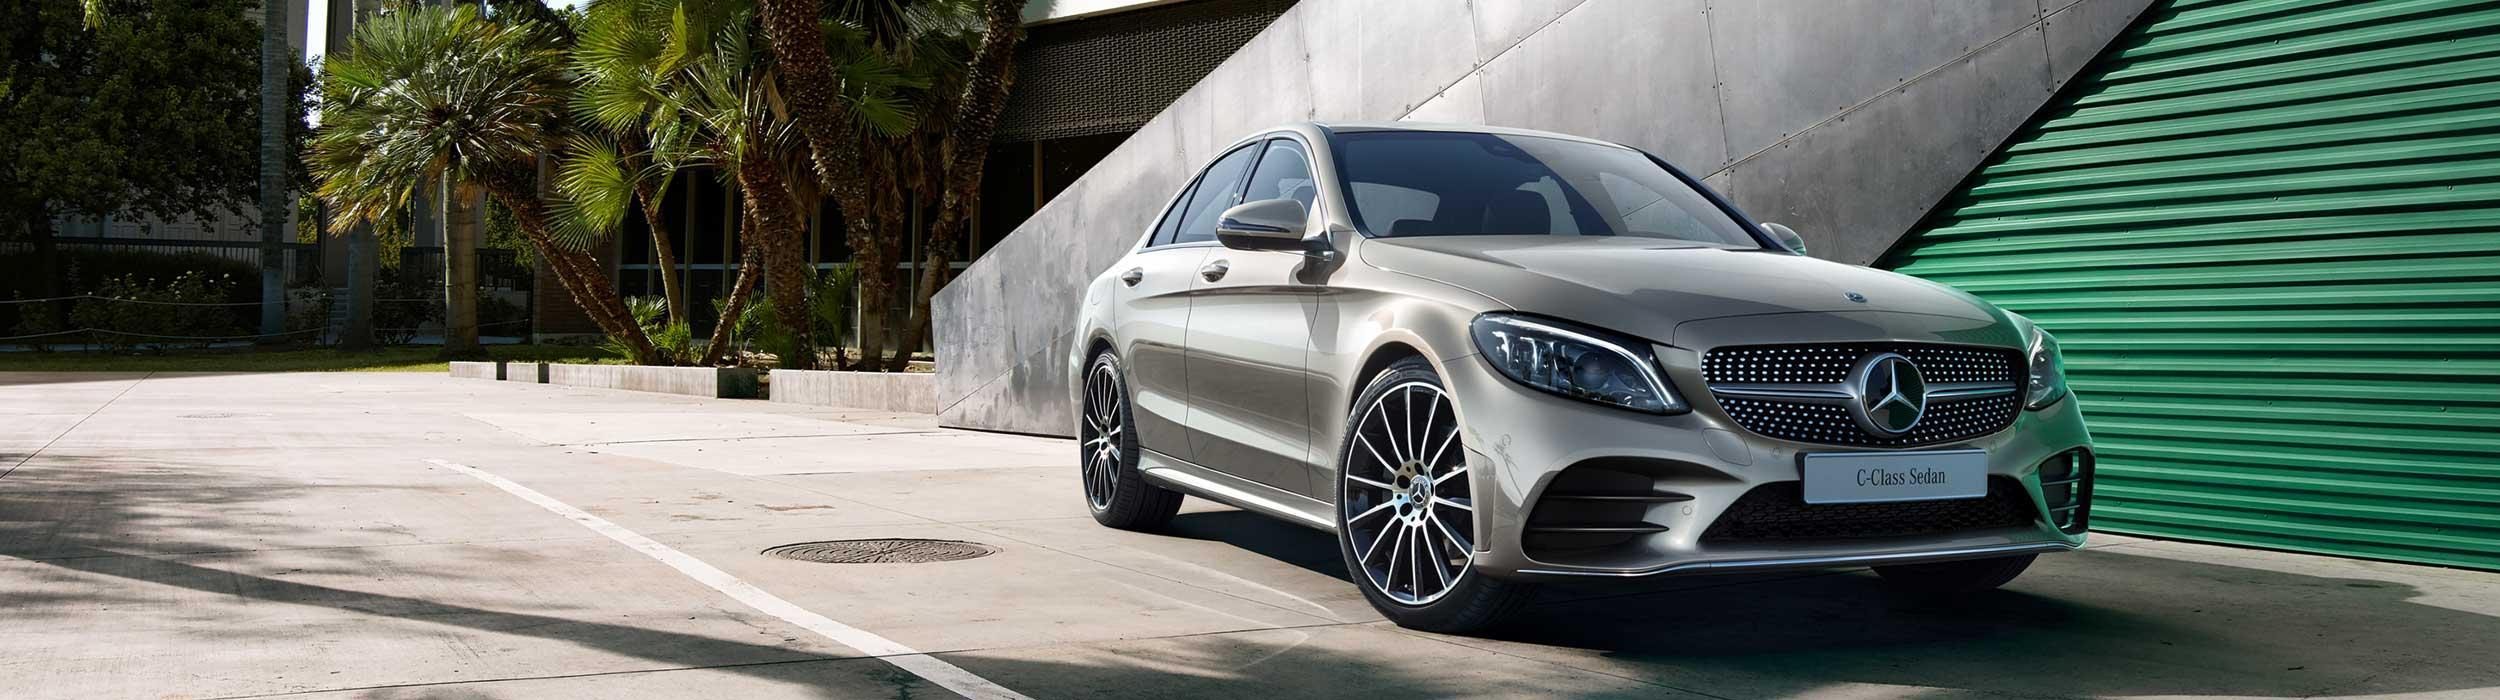 The new Mercedes Benz C-Class